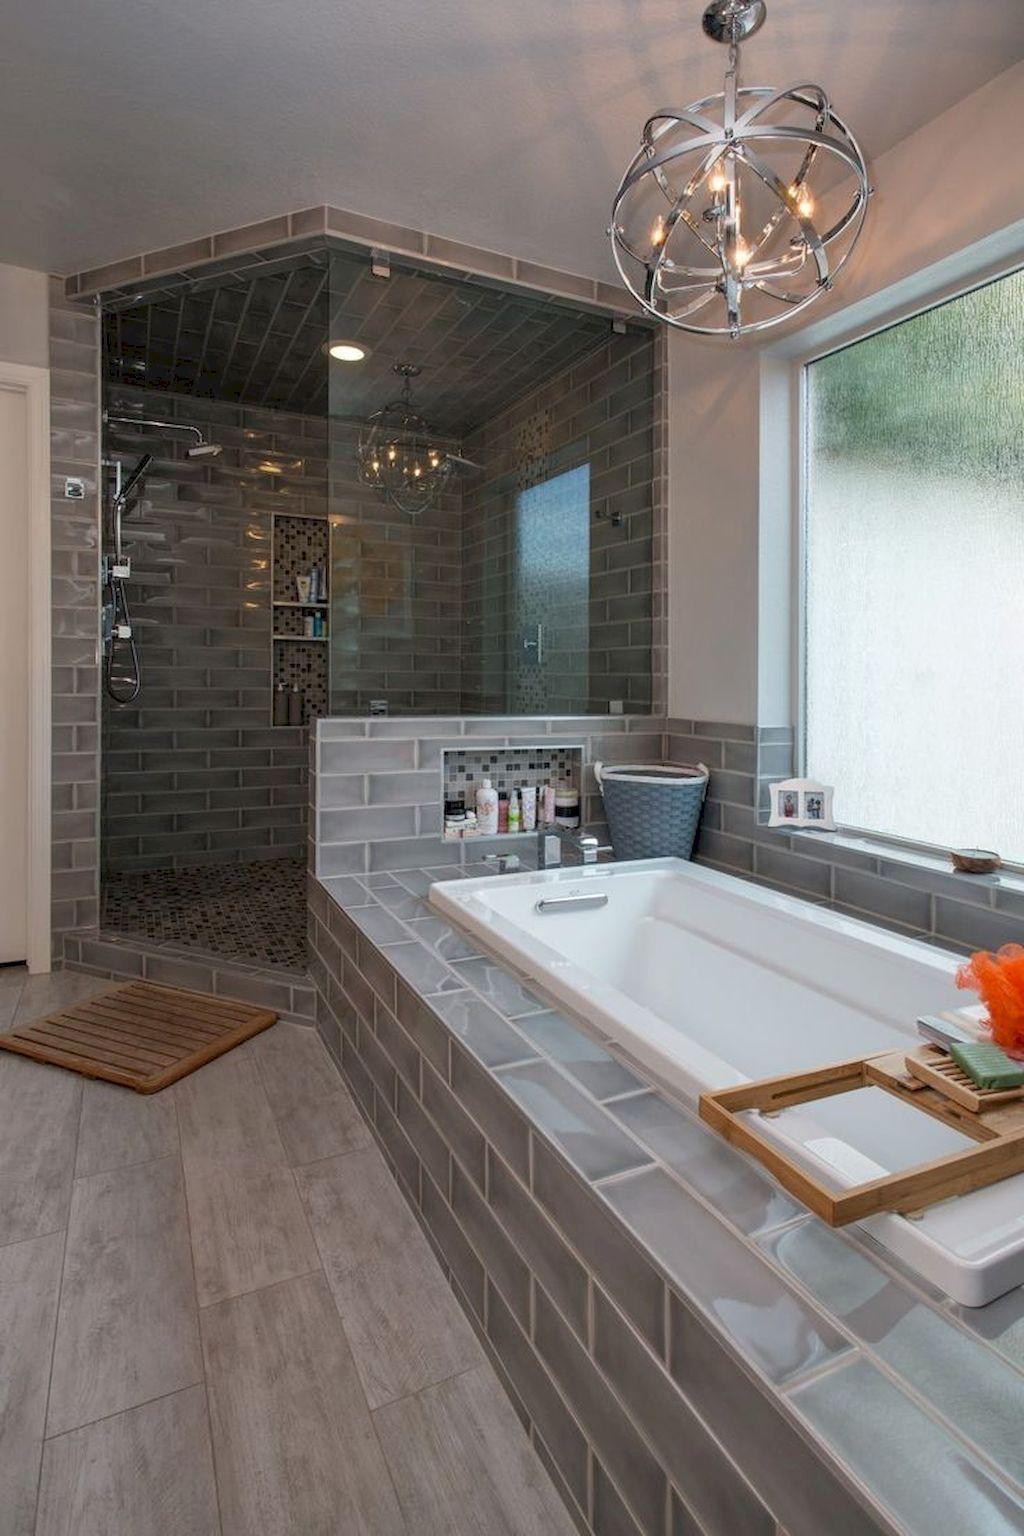 Photo of 65 Farmhouse Master Bathroom Remodel Decor Ideas #dreambathrooms Das Bett ist …